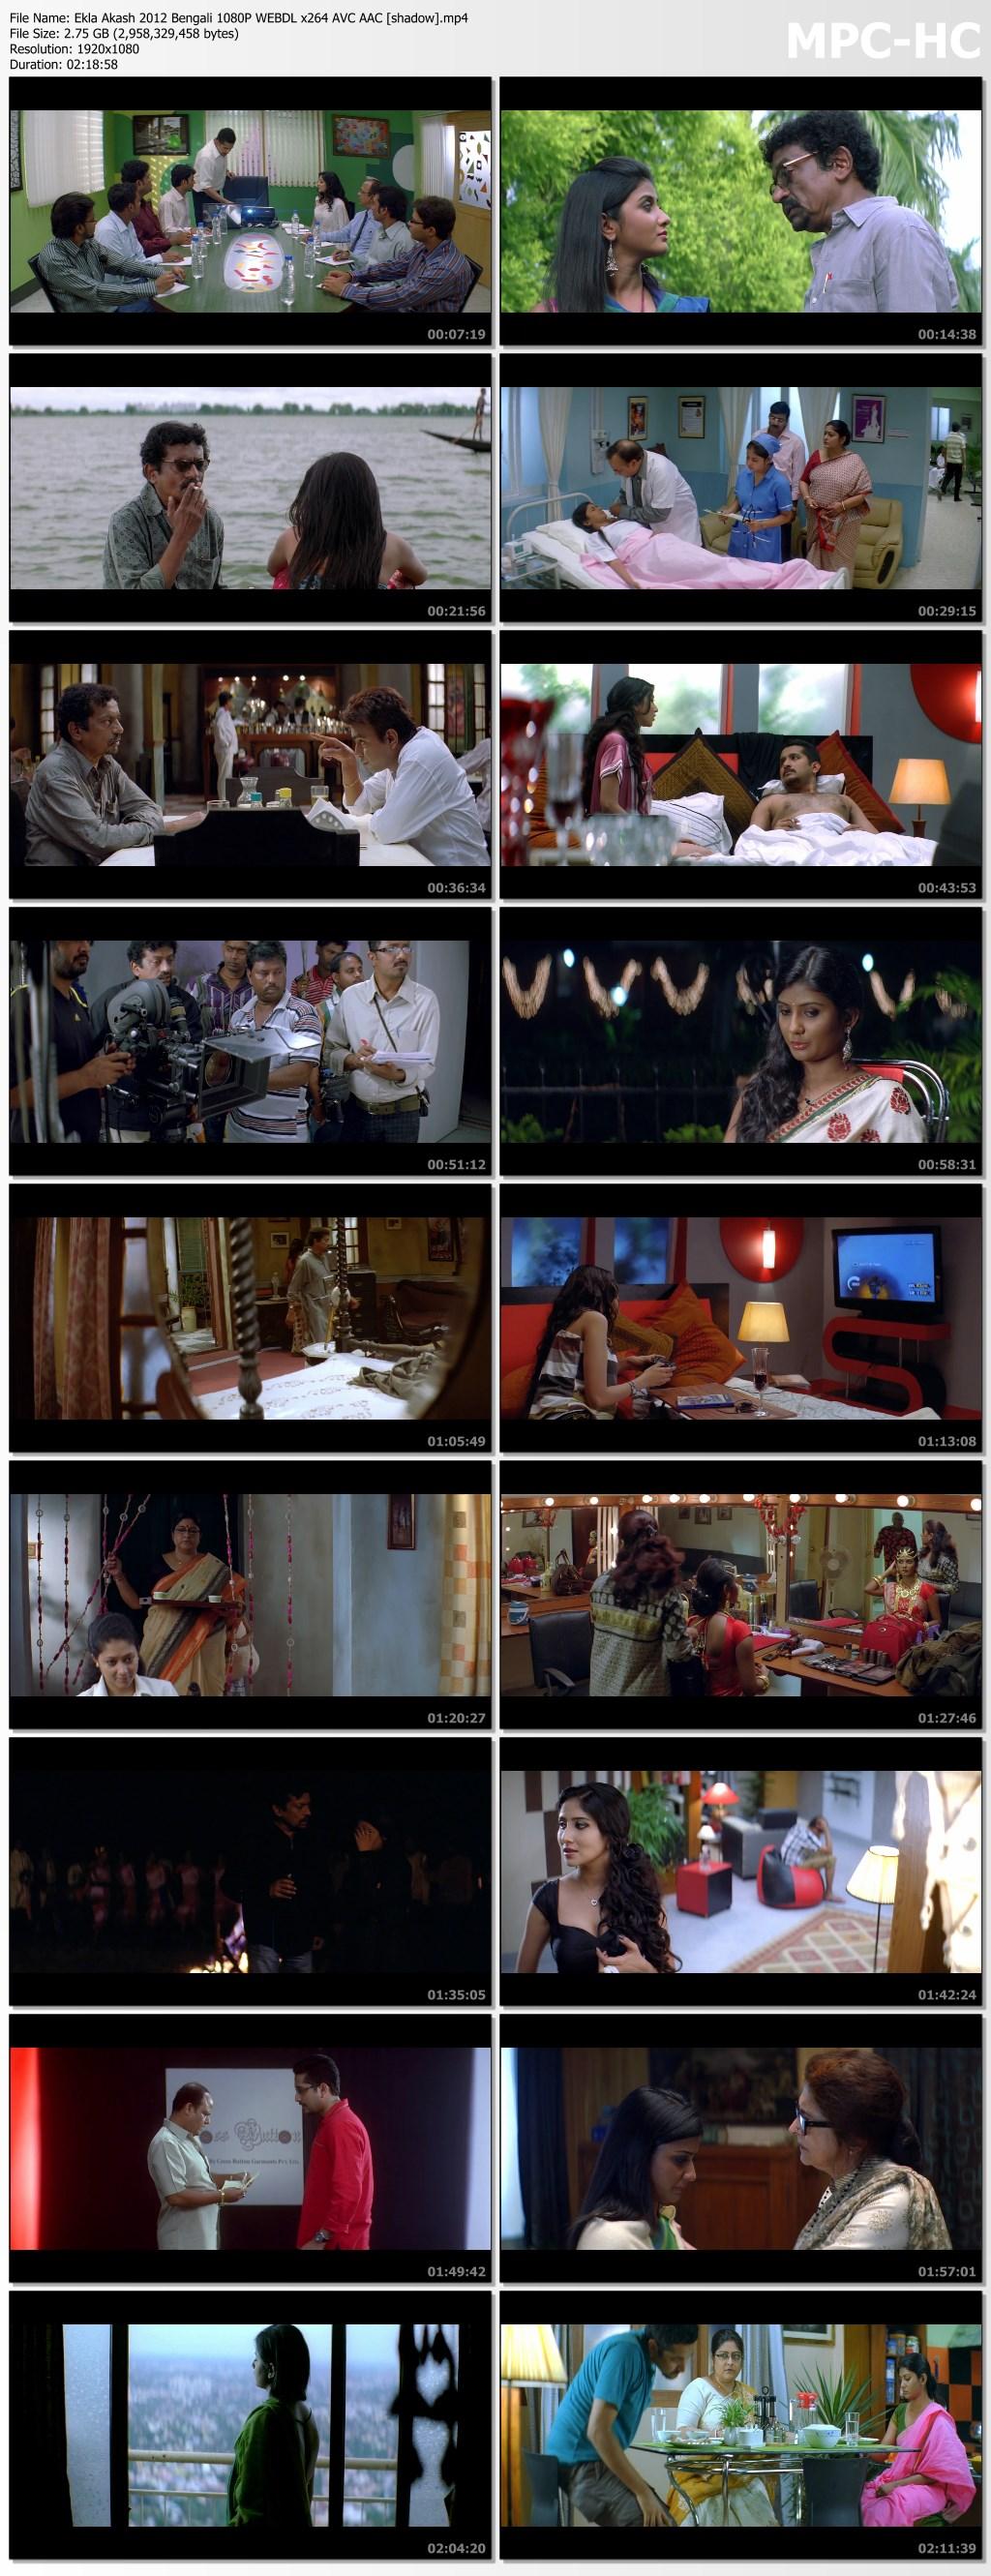 Ekla Akash 2012 Bengali 1080P WEBDL x264 AVC AAC [shadow].mp4 thumbs